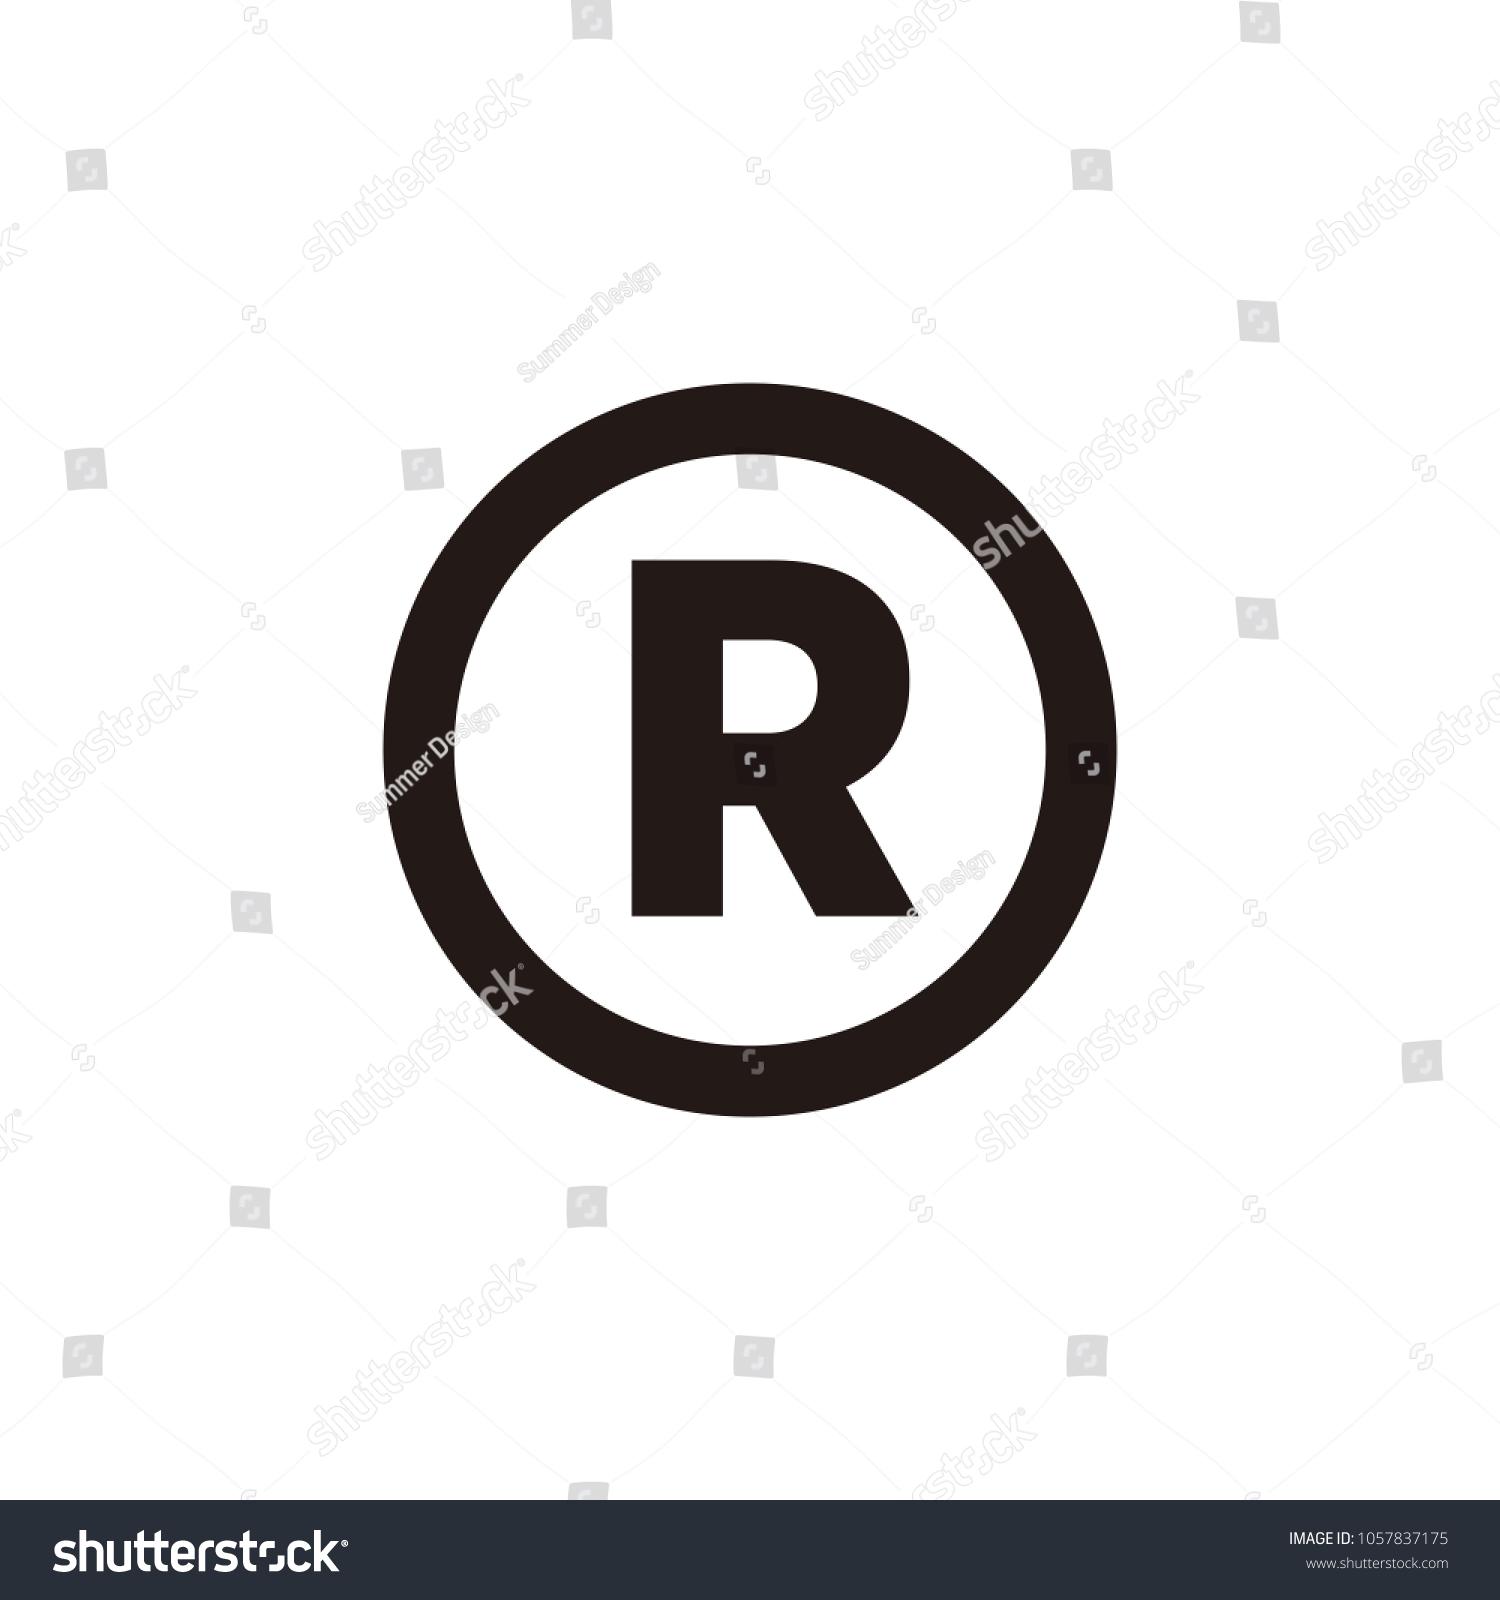 Registered trademark icon symbol stock vector 1057837175 shutterstock registered trademark icon symbol buycottarizona Gallery